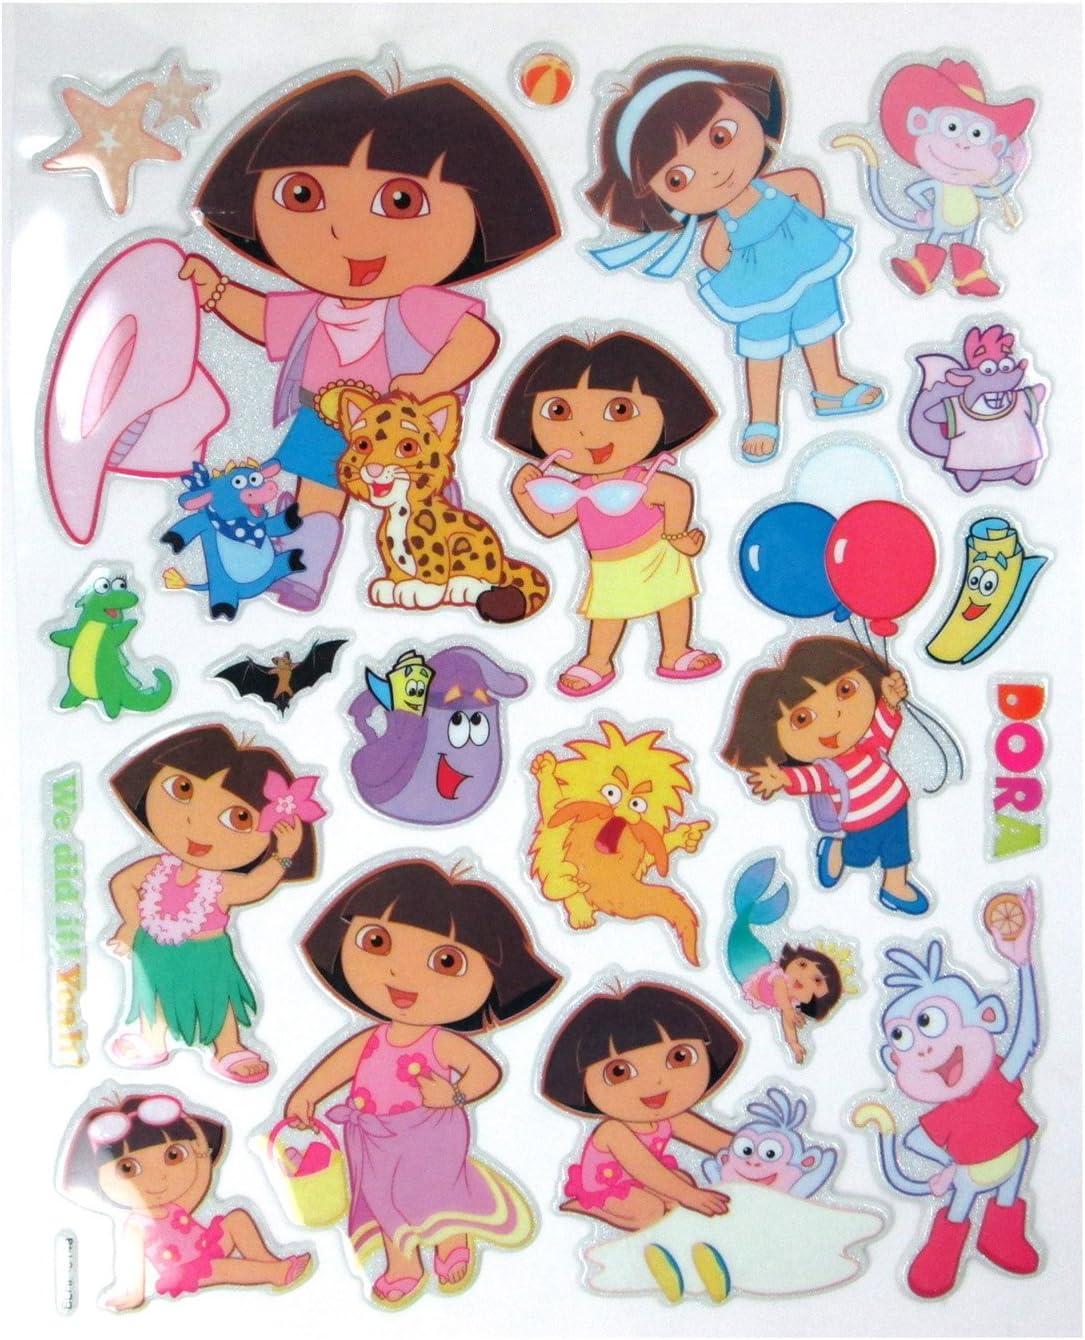 Dora La Exploradora Sticker Sheet - Dora Stickers: Amazon.es ...